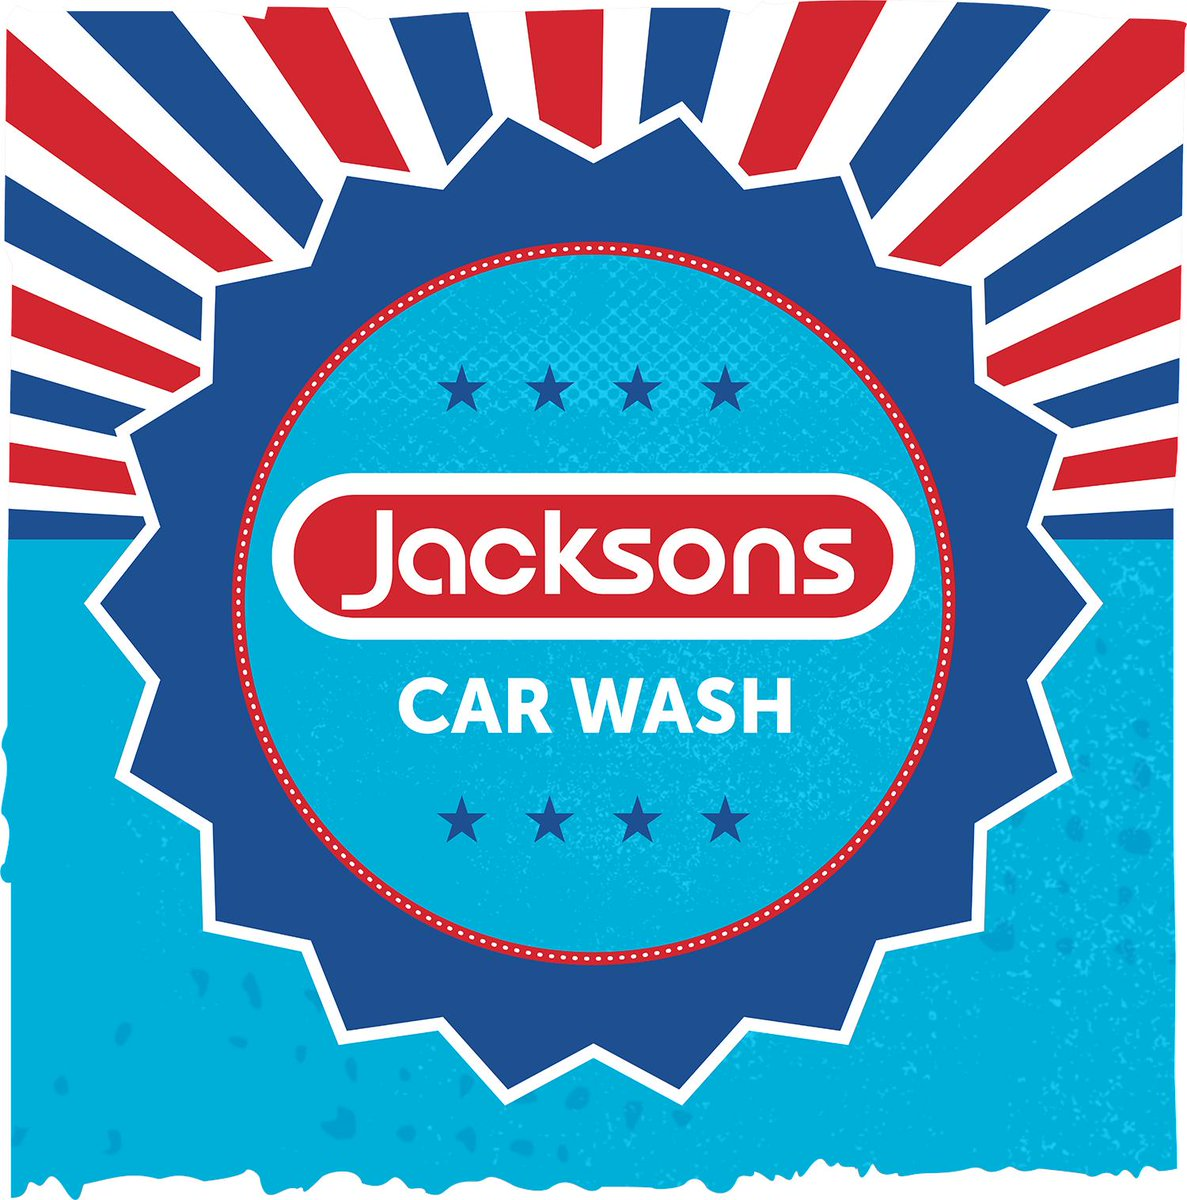 Jacksons Car Wash Jacksonswash Twitter Profile And Downloader Twipu